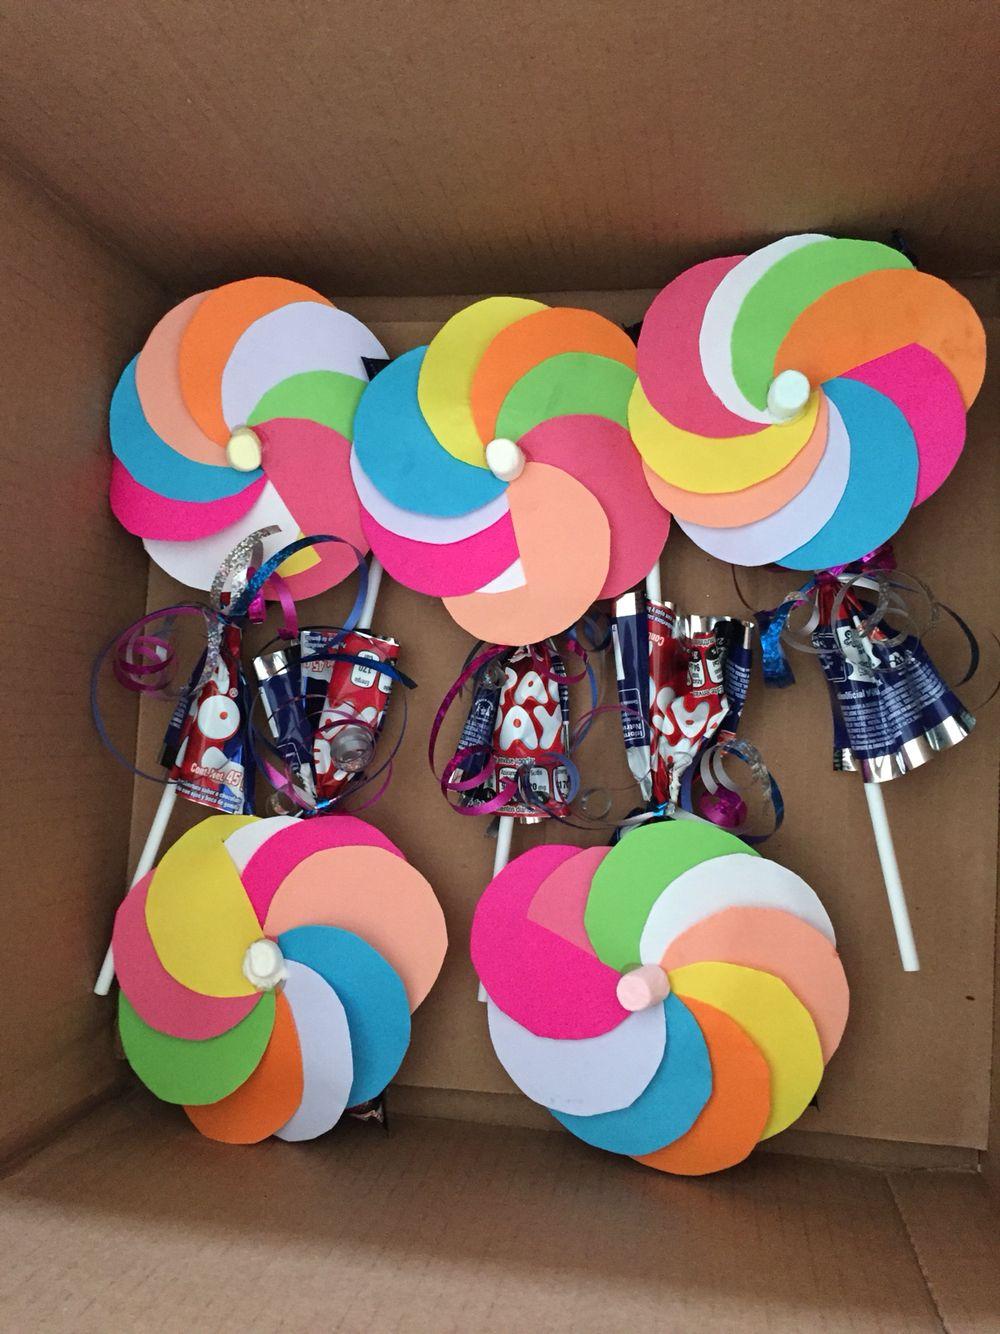 Paletas payaso regalitos para los niños | Manualidades | Pinterest ...